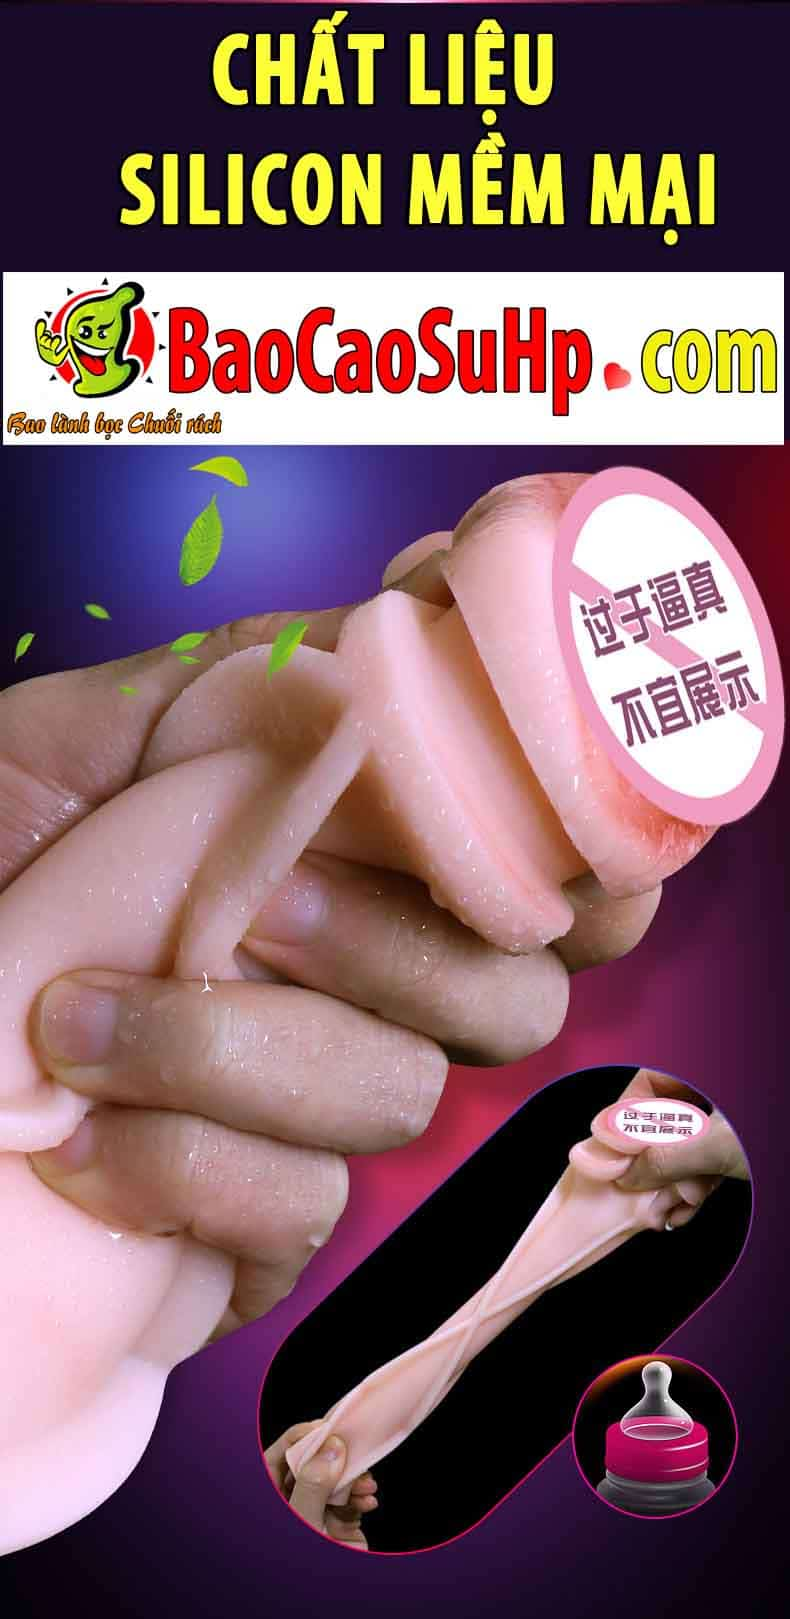 20181213104330 6005329 sextoy coc am dao sexual nong bong 3 - Sextoy cốc âm đạo cầm tay Sexual nóng bỏng